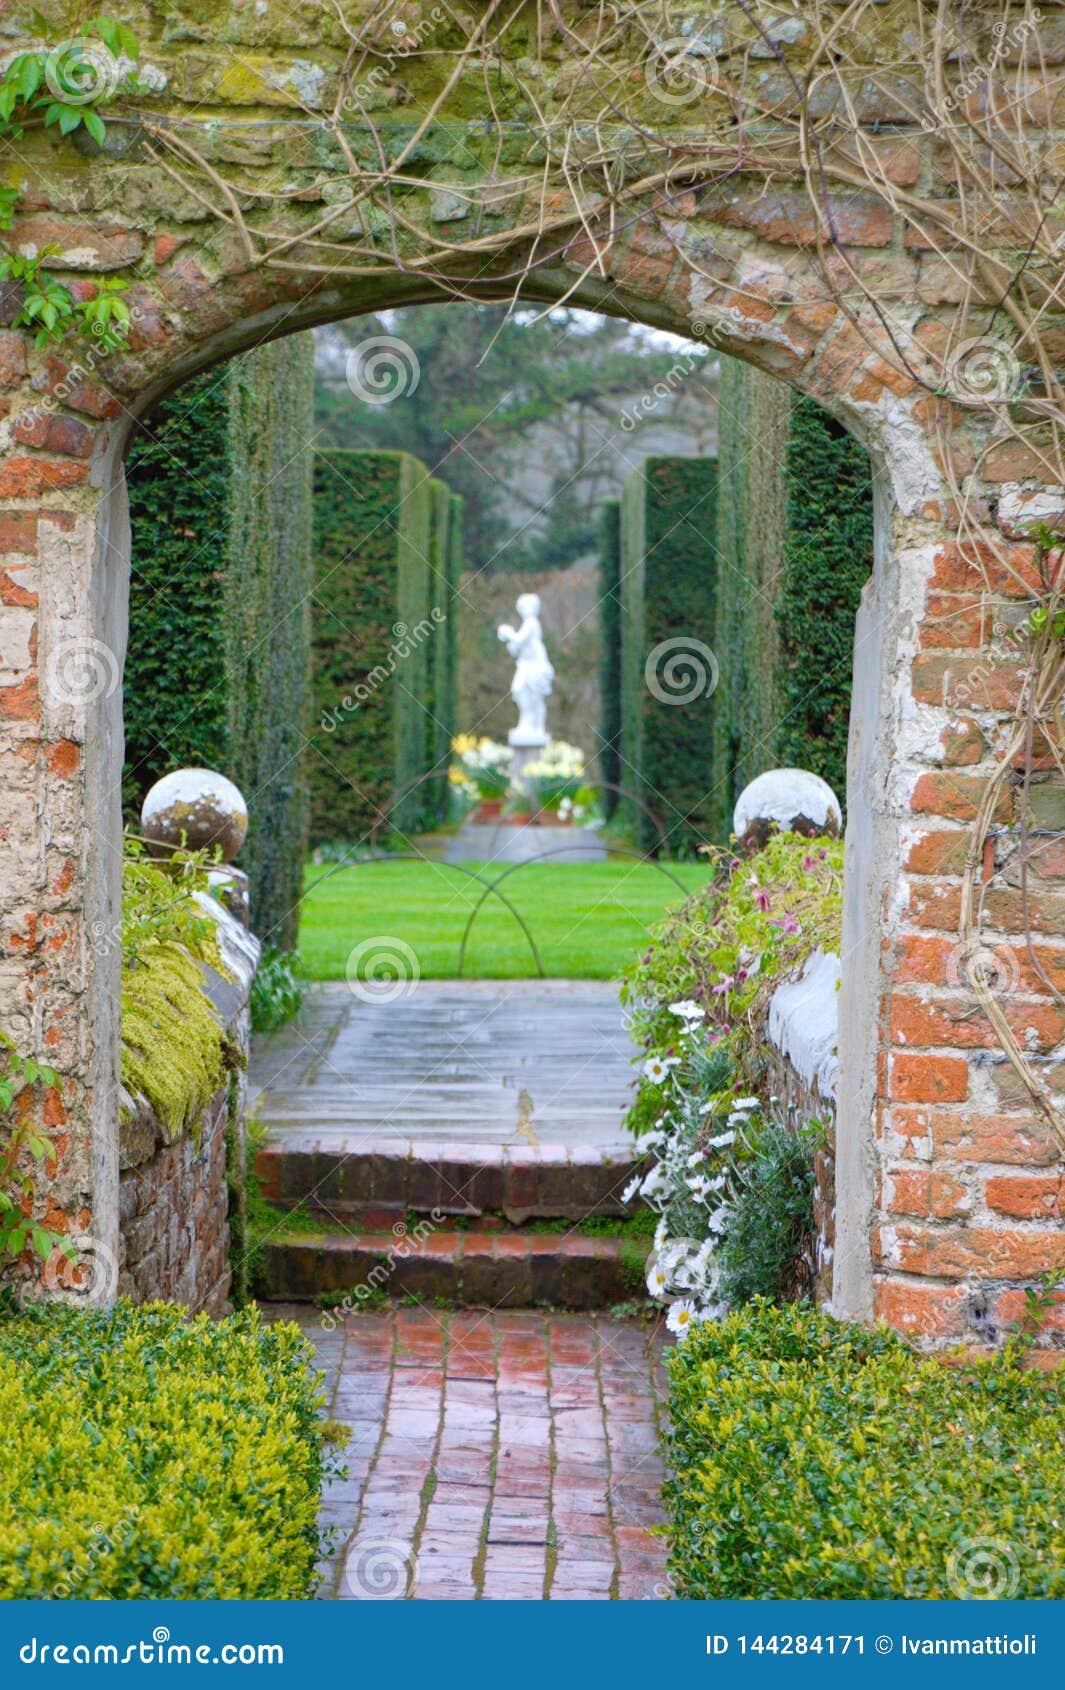 English Garden Gate With A Marmoreal Sculpture Between Shrubs Of